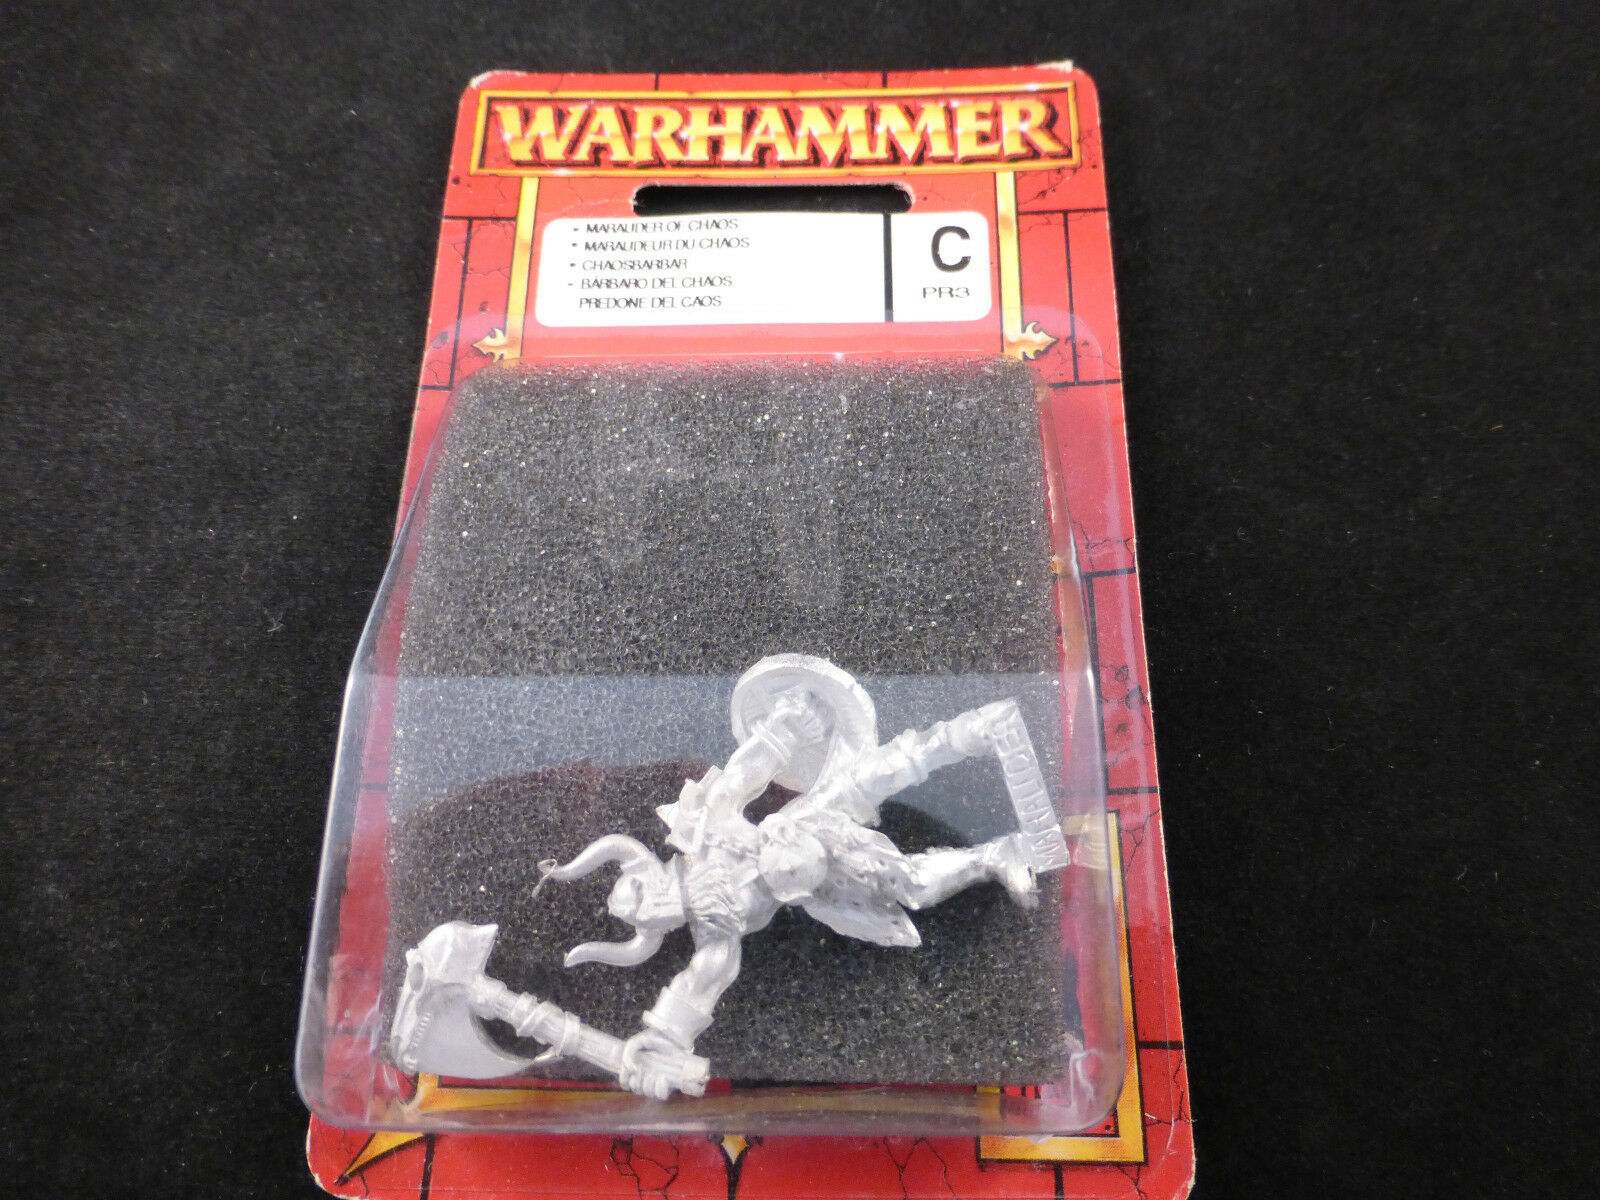 Limited Release PR03 Promo 2002 Warhammer Chaos Marauder Champion Metal Blister